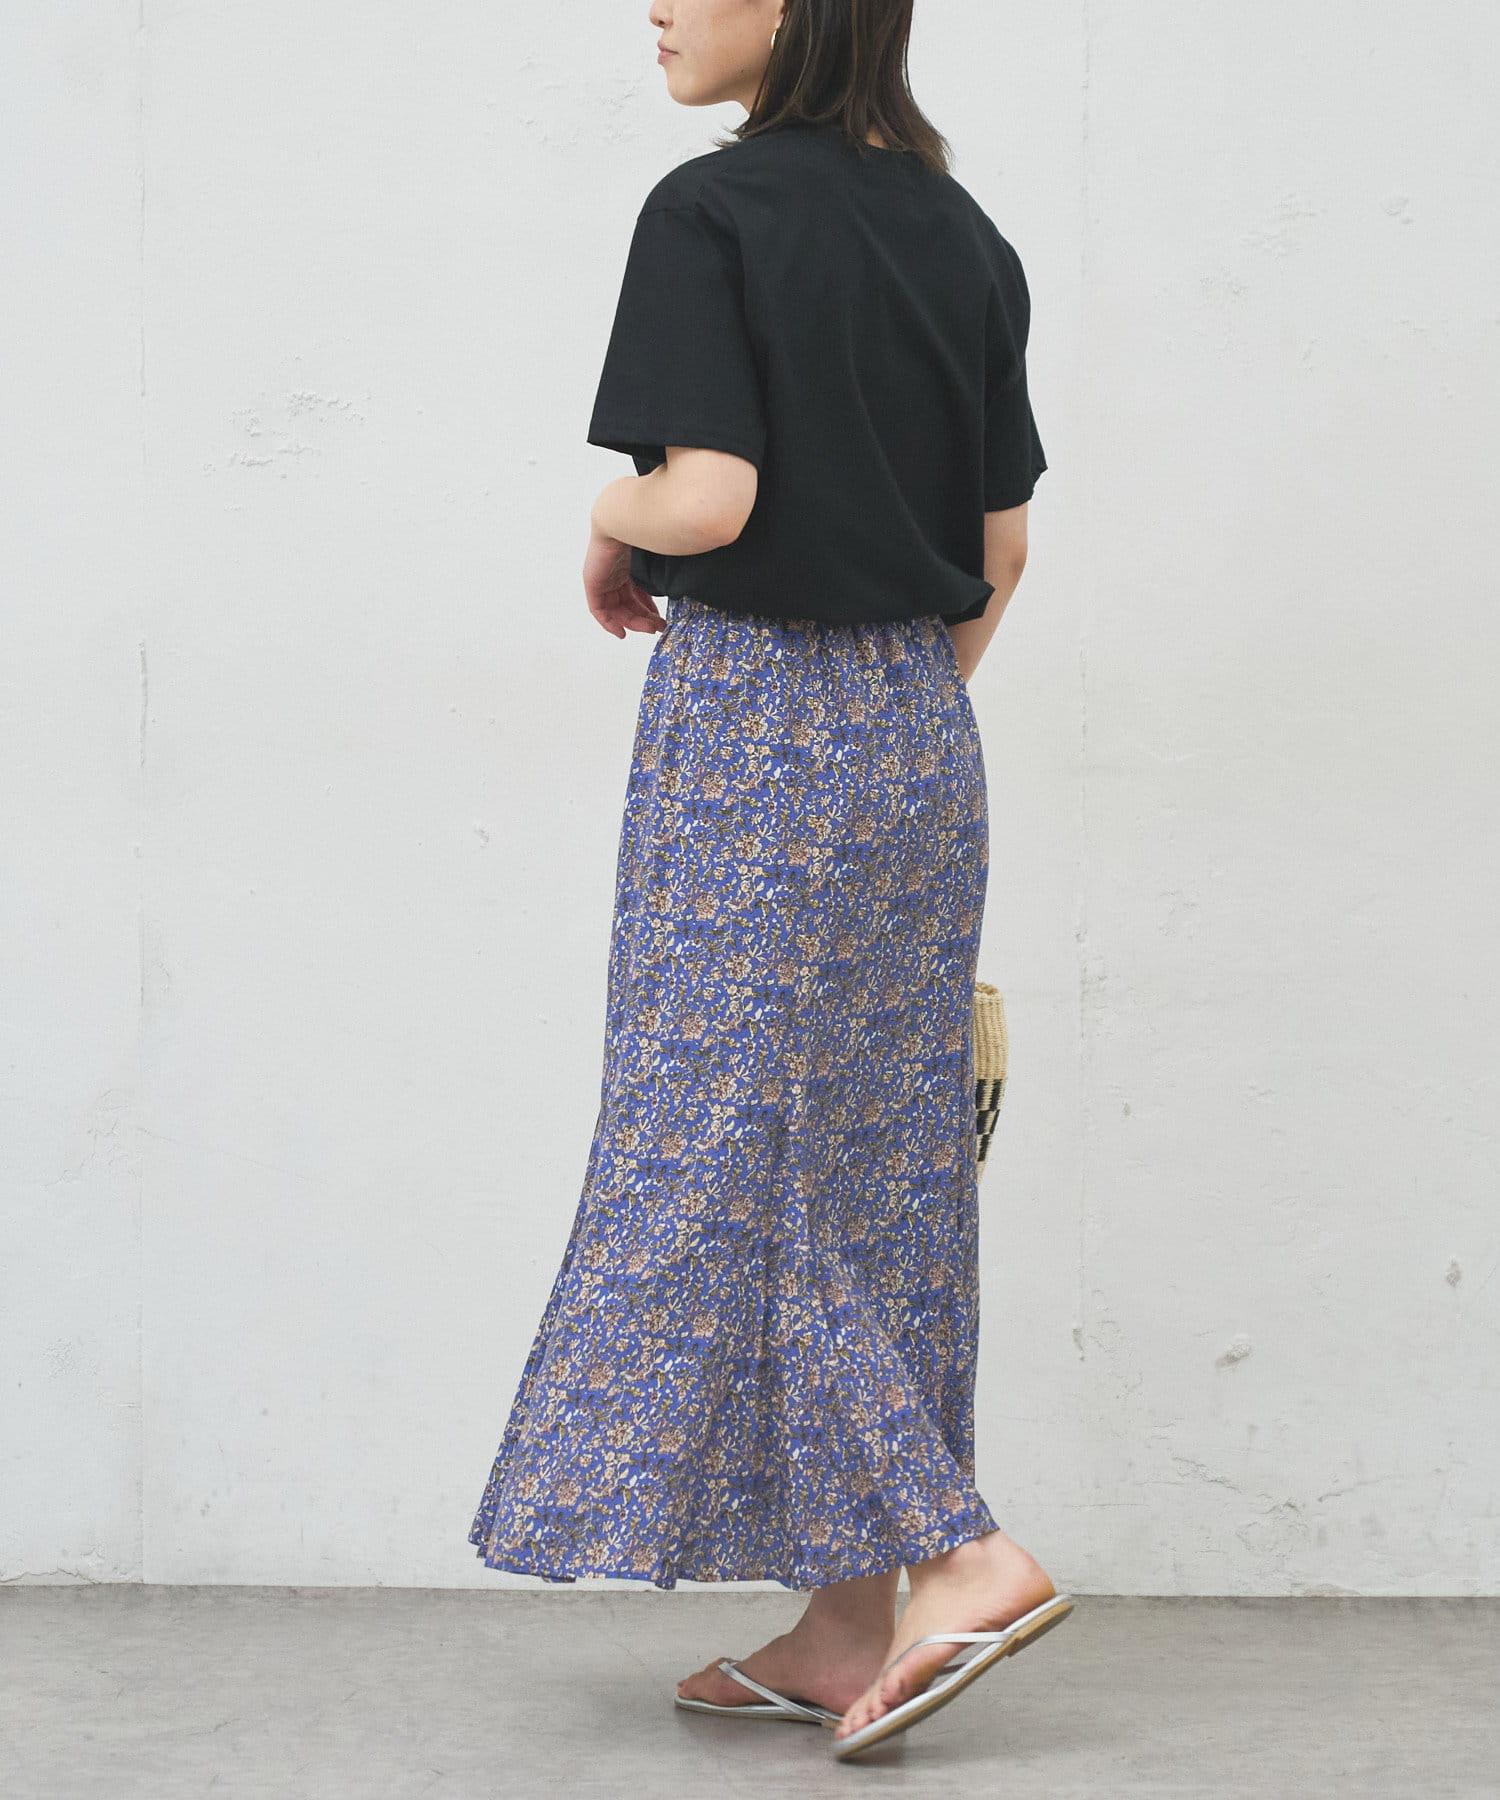 BONbazaar(ボンバザール) 更紗柄プリントスカート